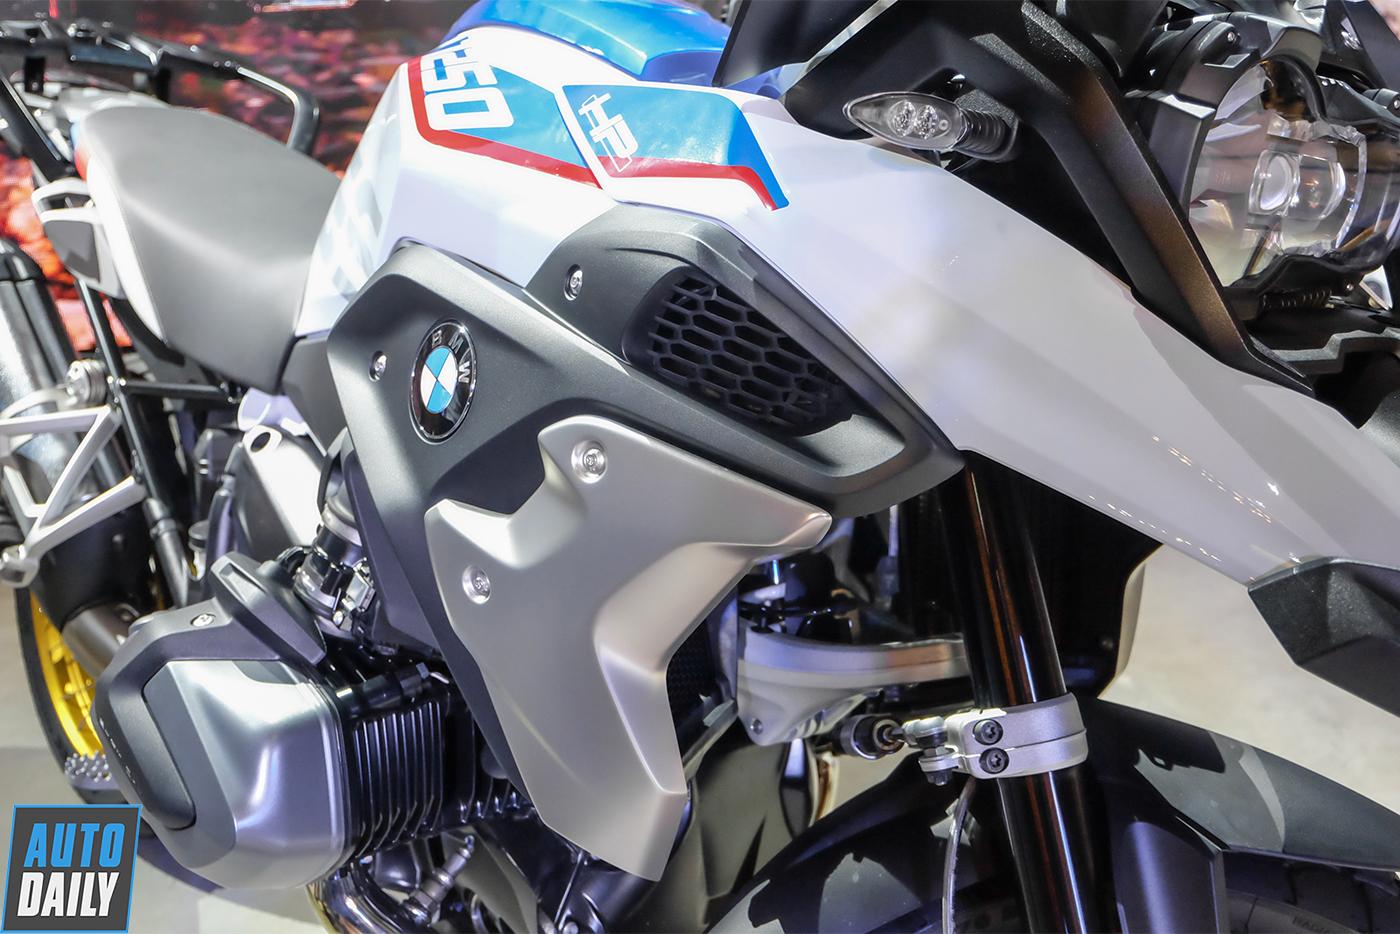 bmw-motorrad-r-1250-gs-2019-8.jpg